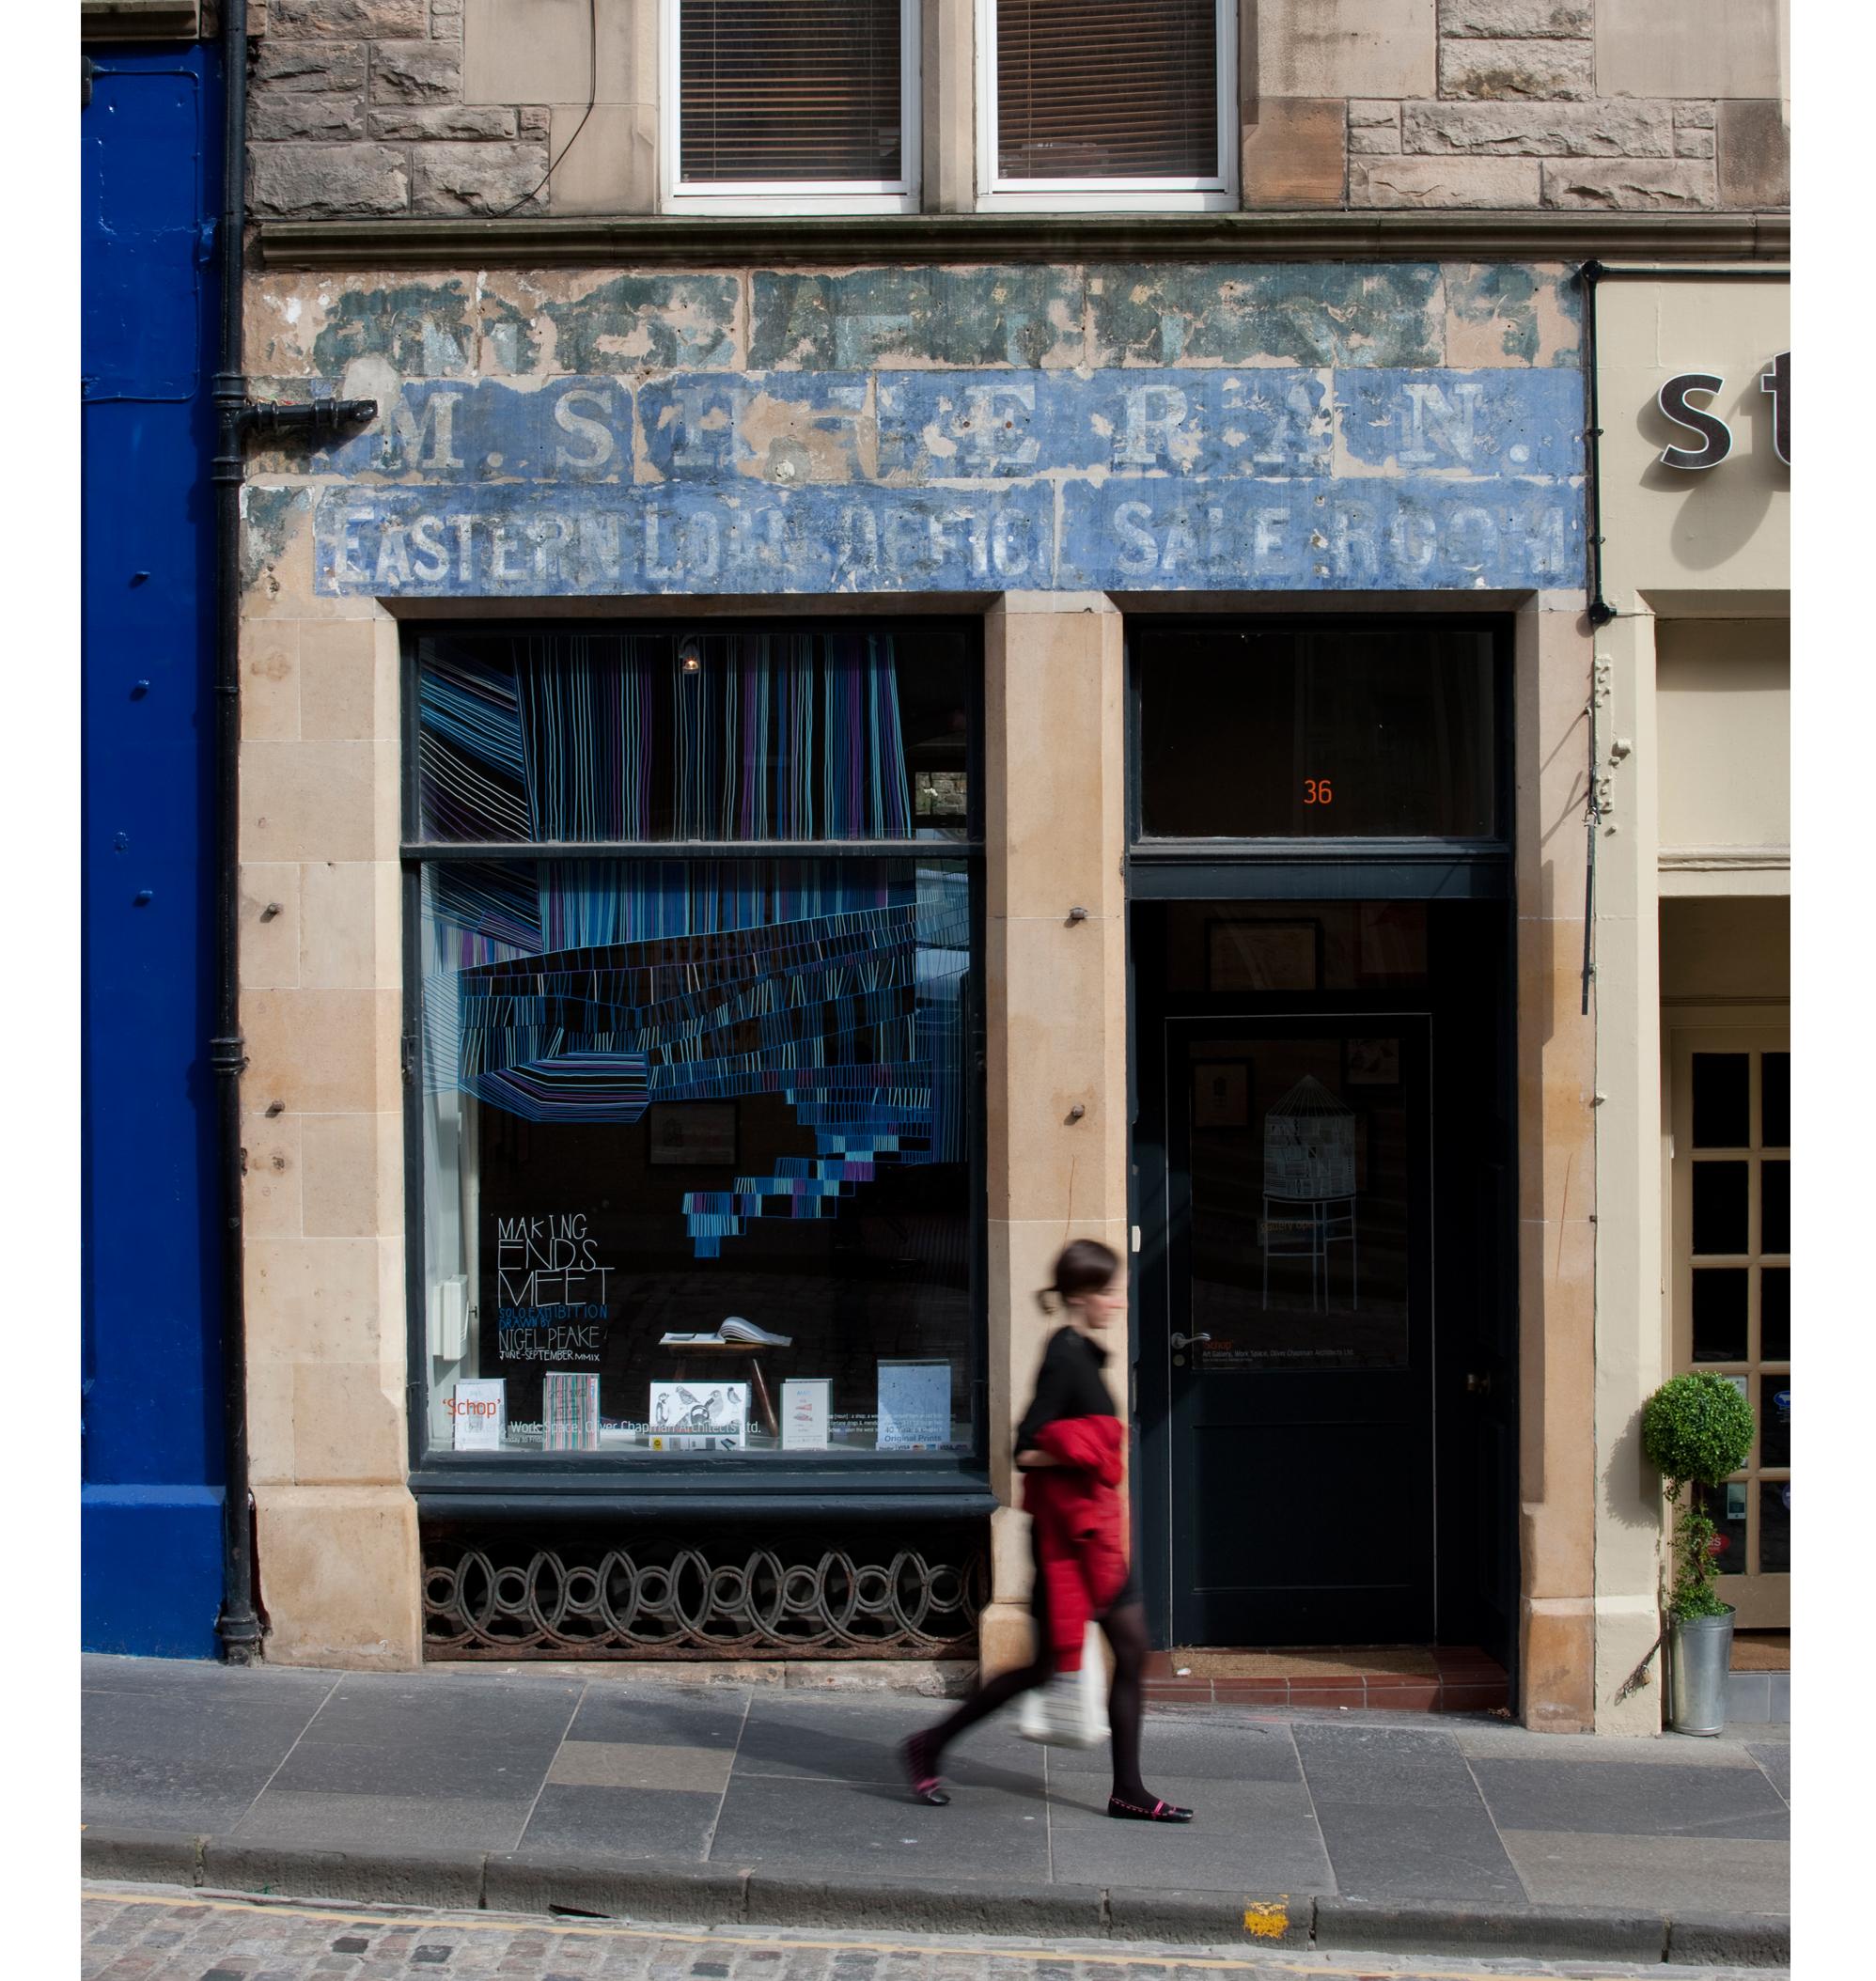 Schop:  St Mary's Street